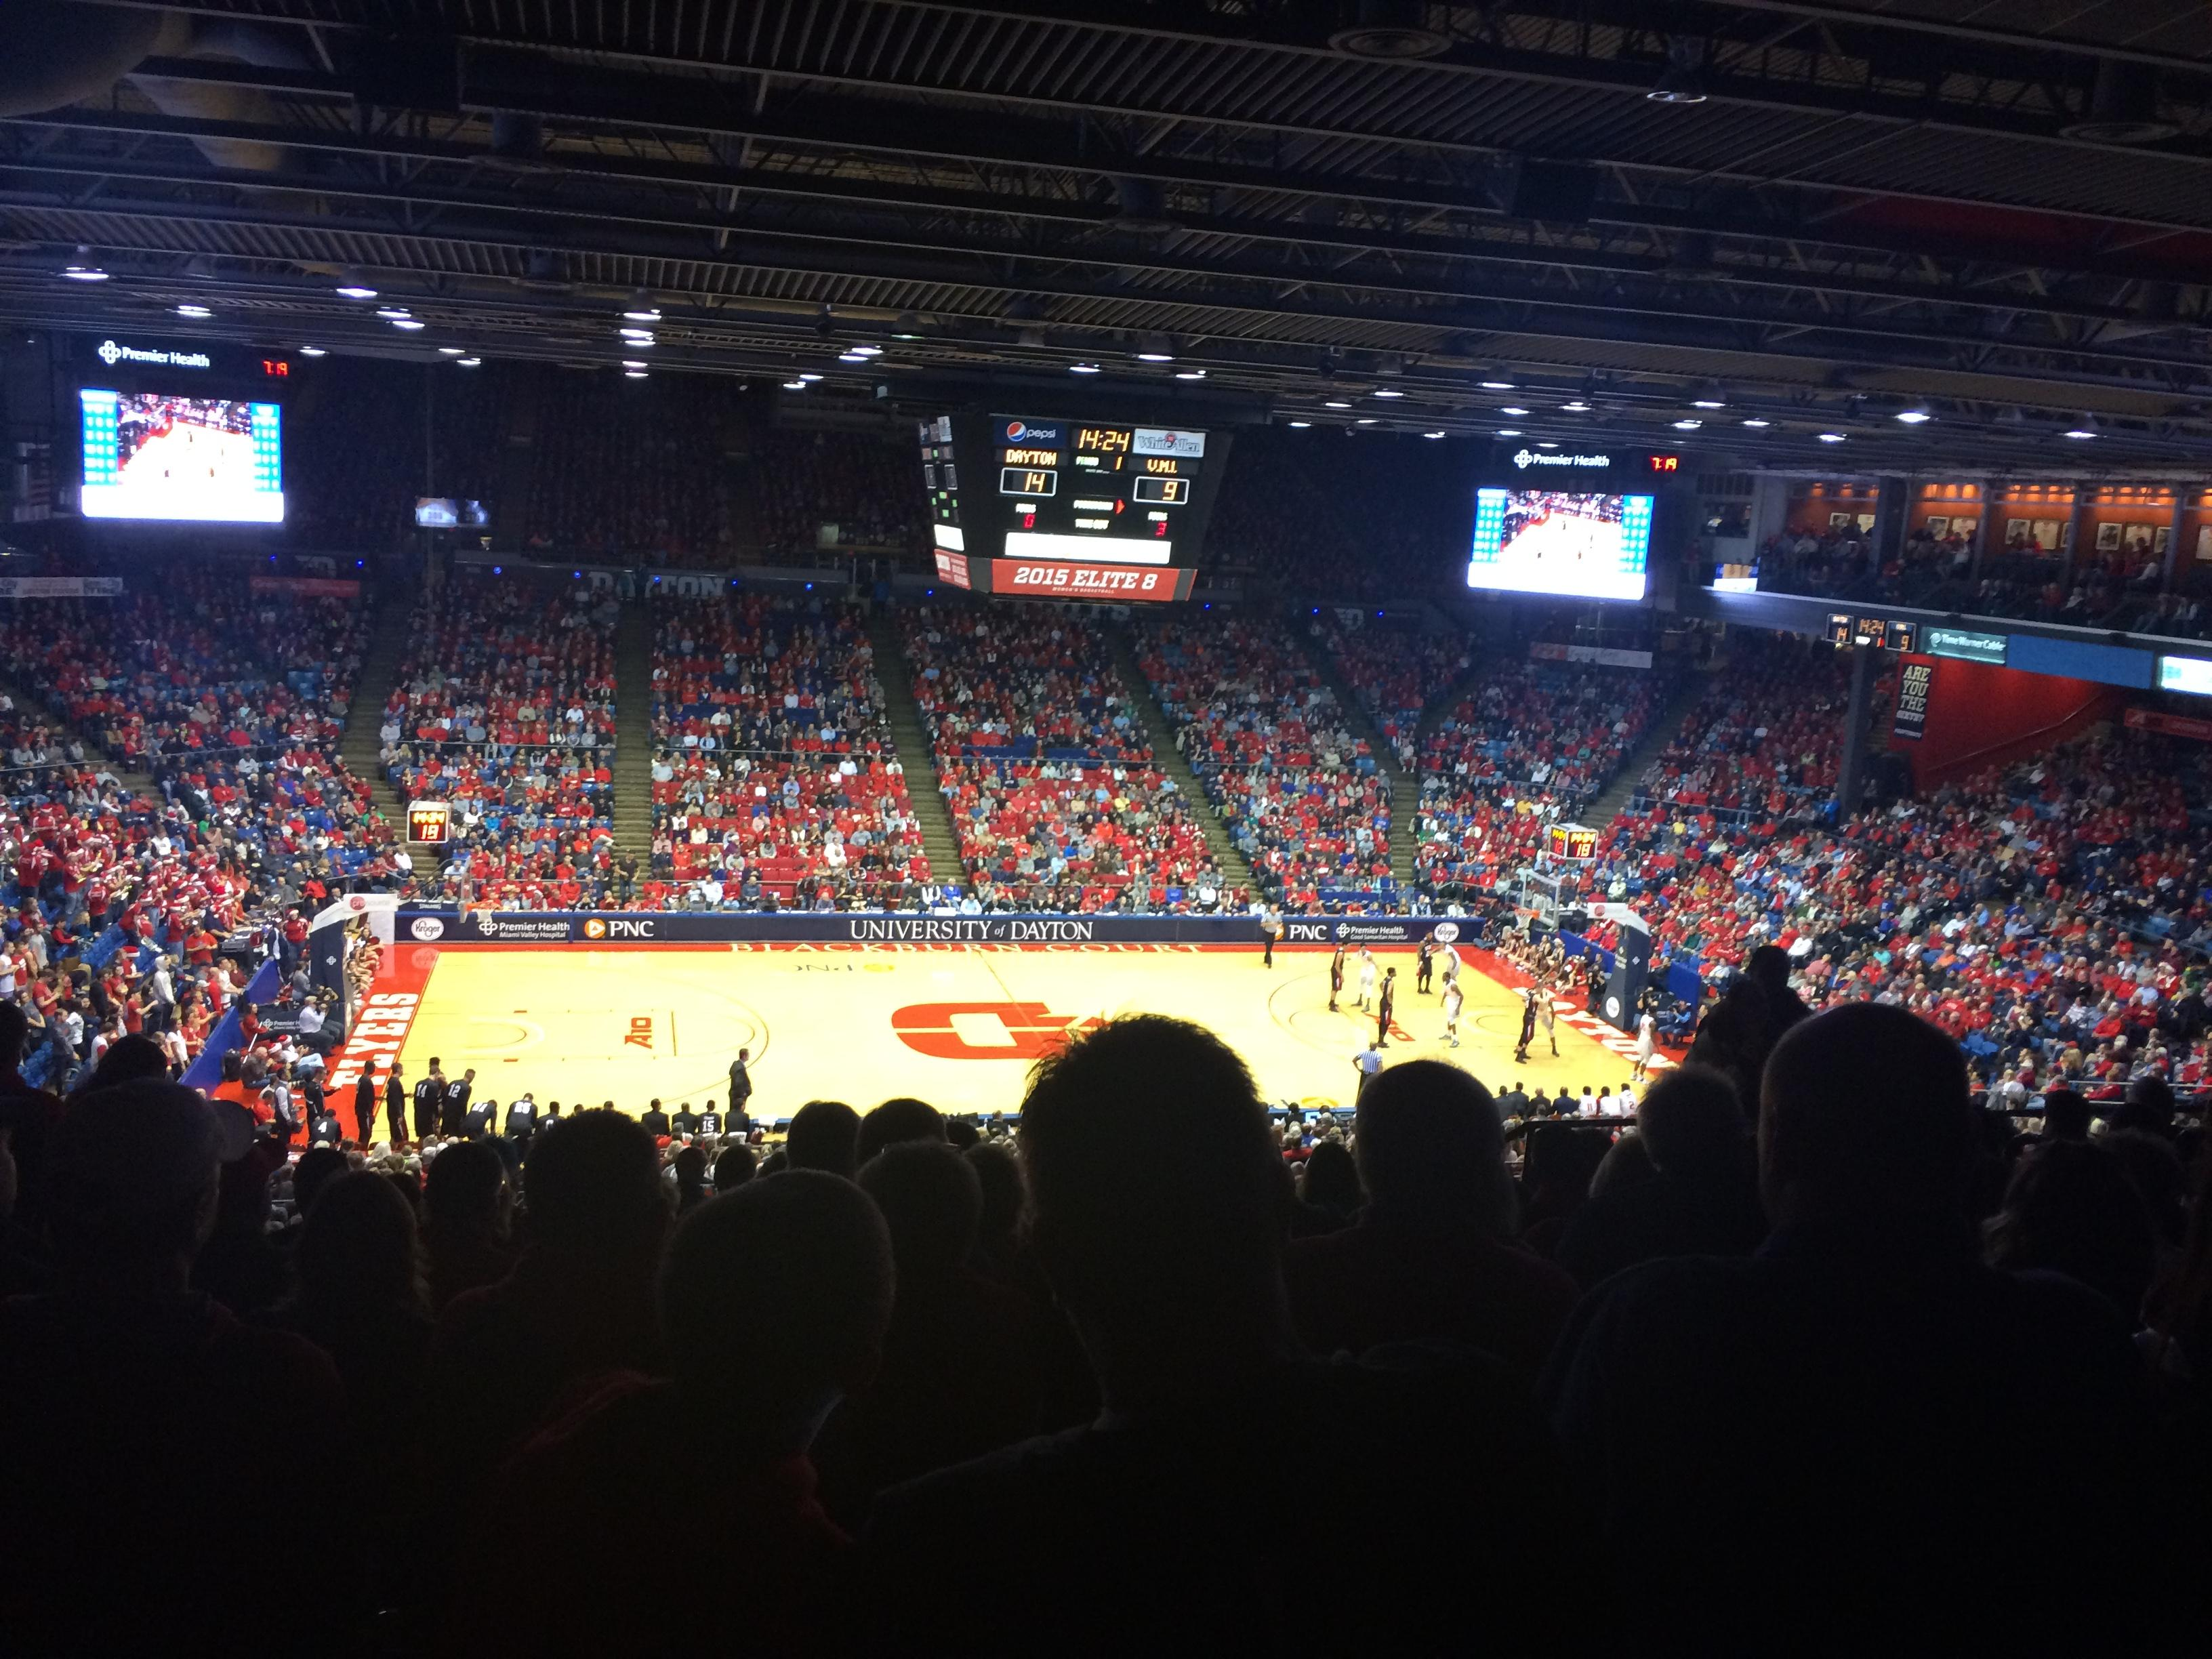 University of Dayton Arena Abschnitt 310 Reihe K Platz 9